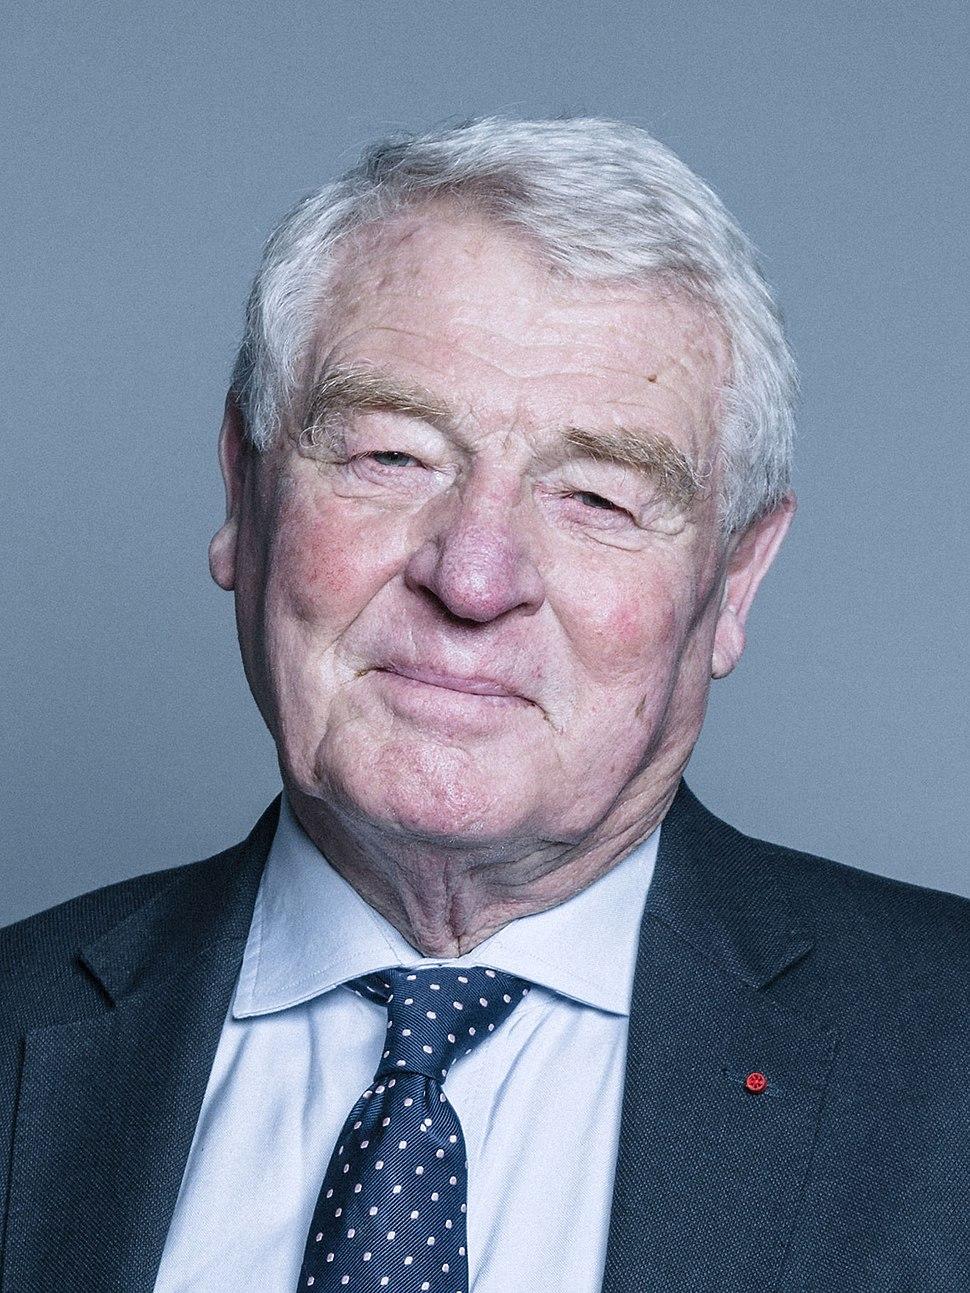 Official portrait of Lord Ashdown of Norton-sub-Hamdon crop 2